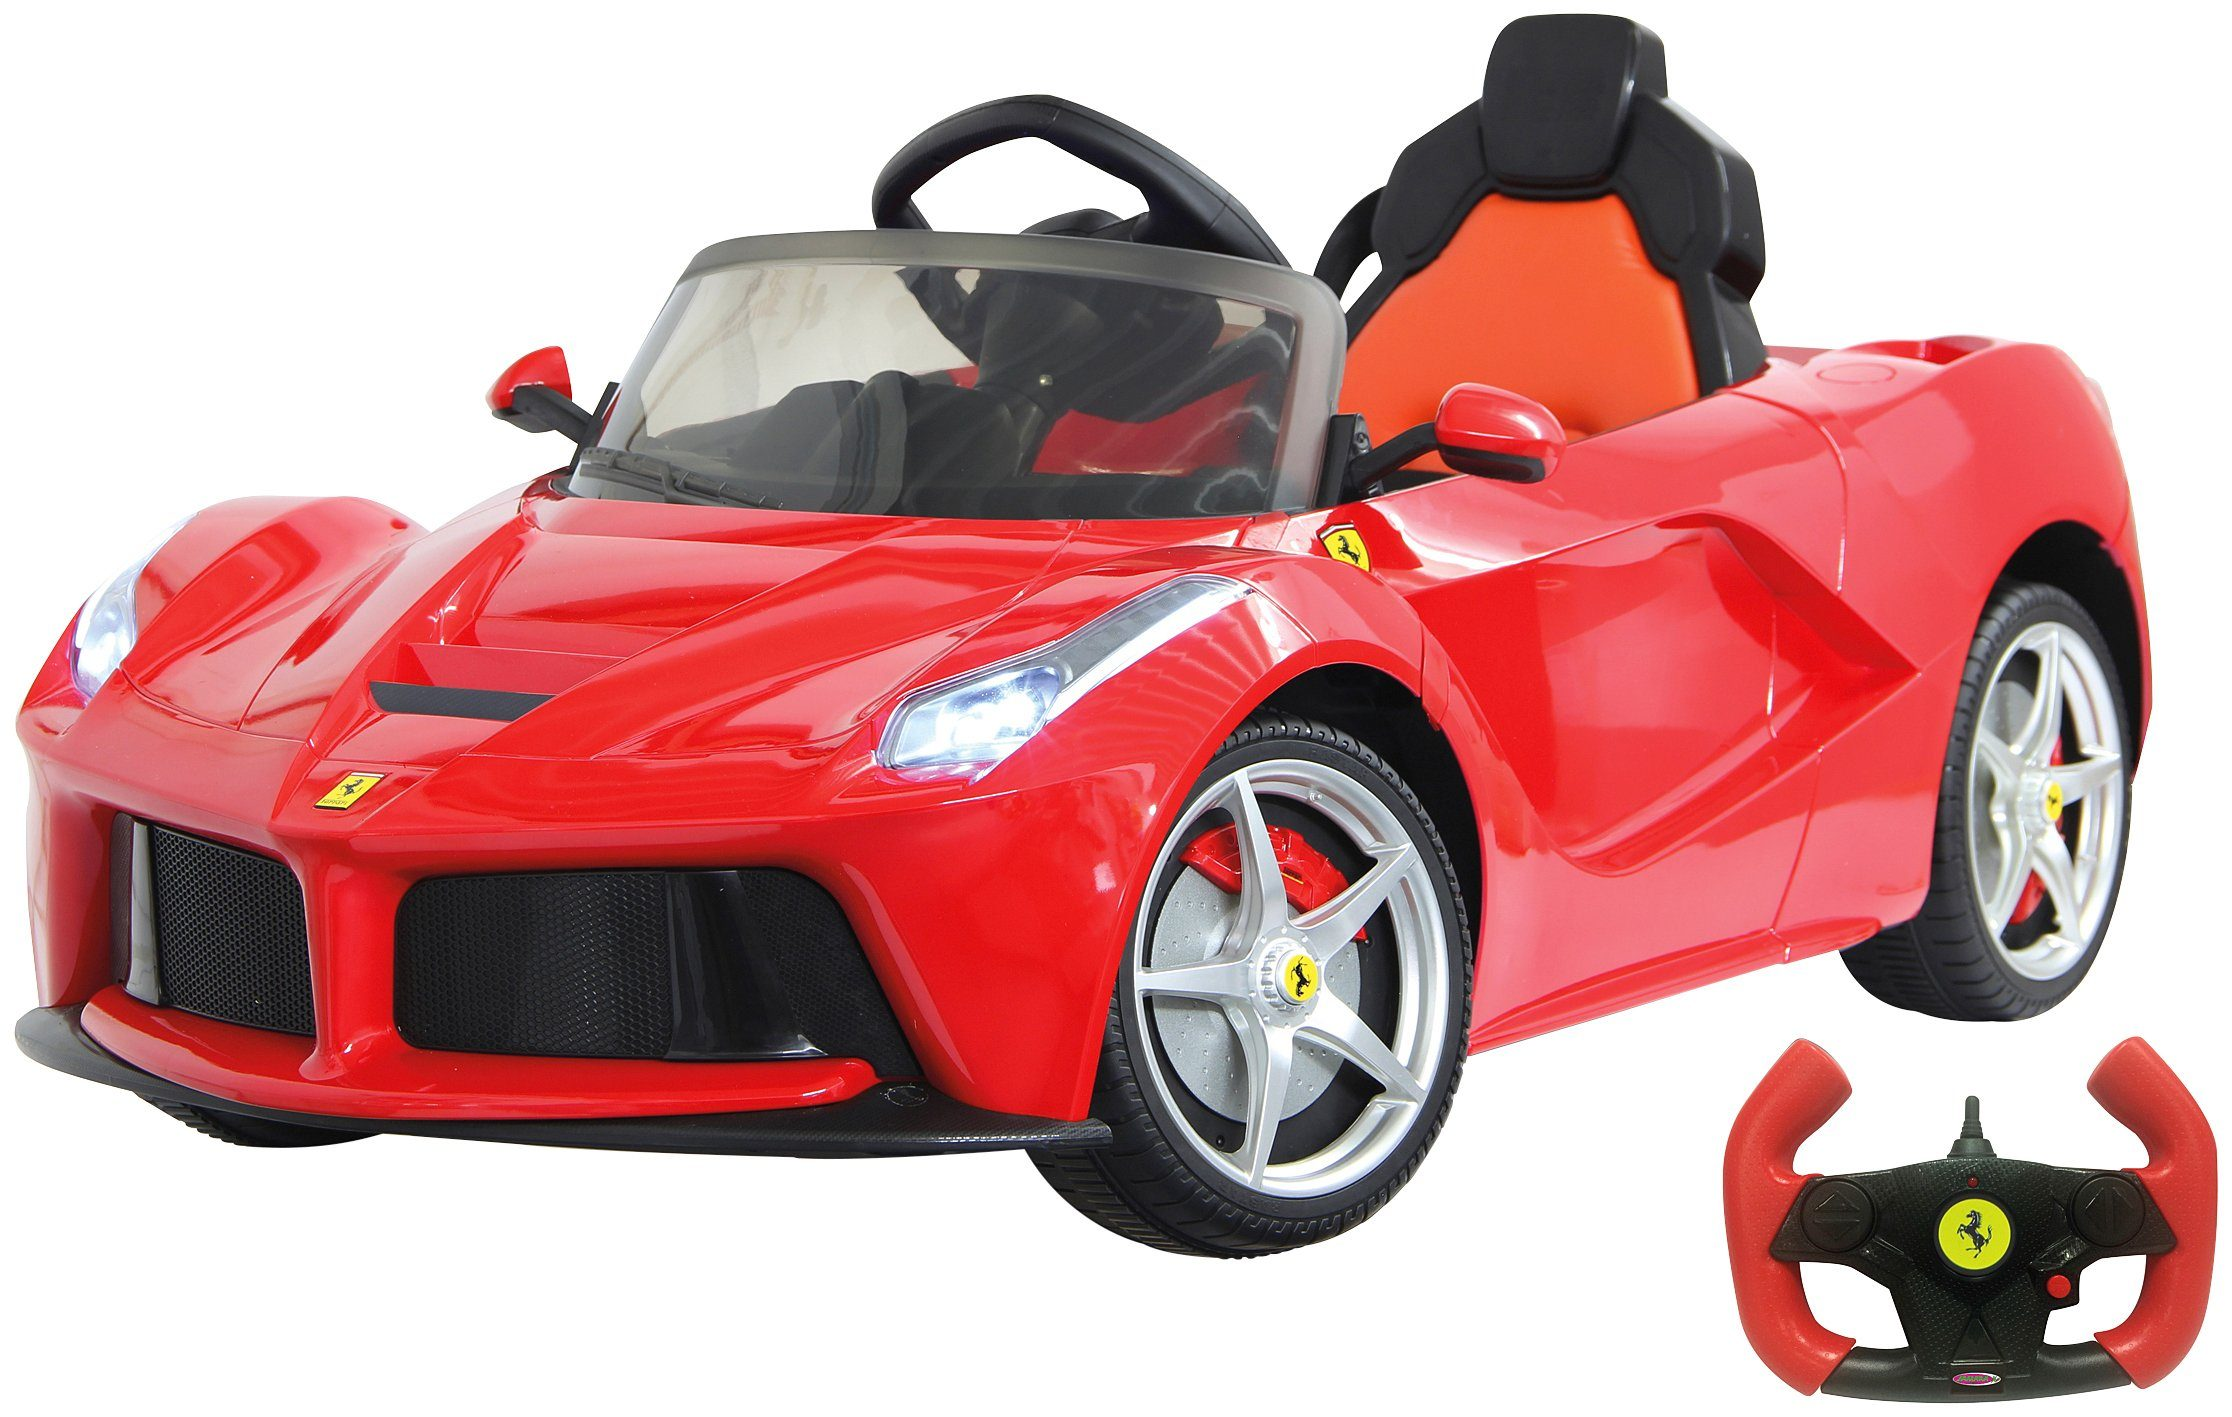 JAMARA KIDS Elektroauto »Ride-on Ferrari LaFerrari«, rot, inkl. Fernsteuerung